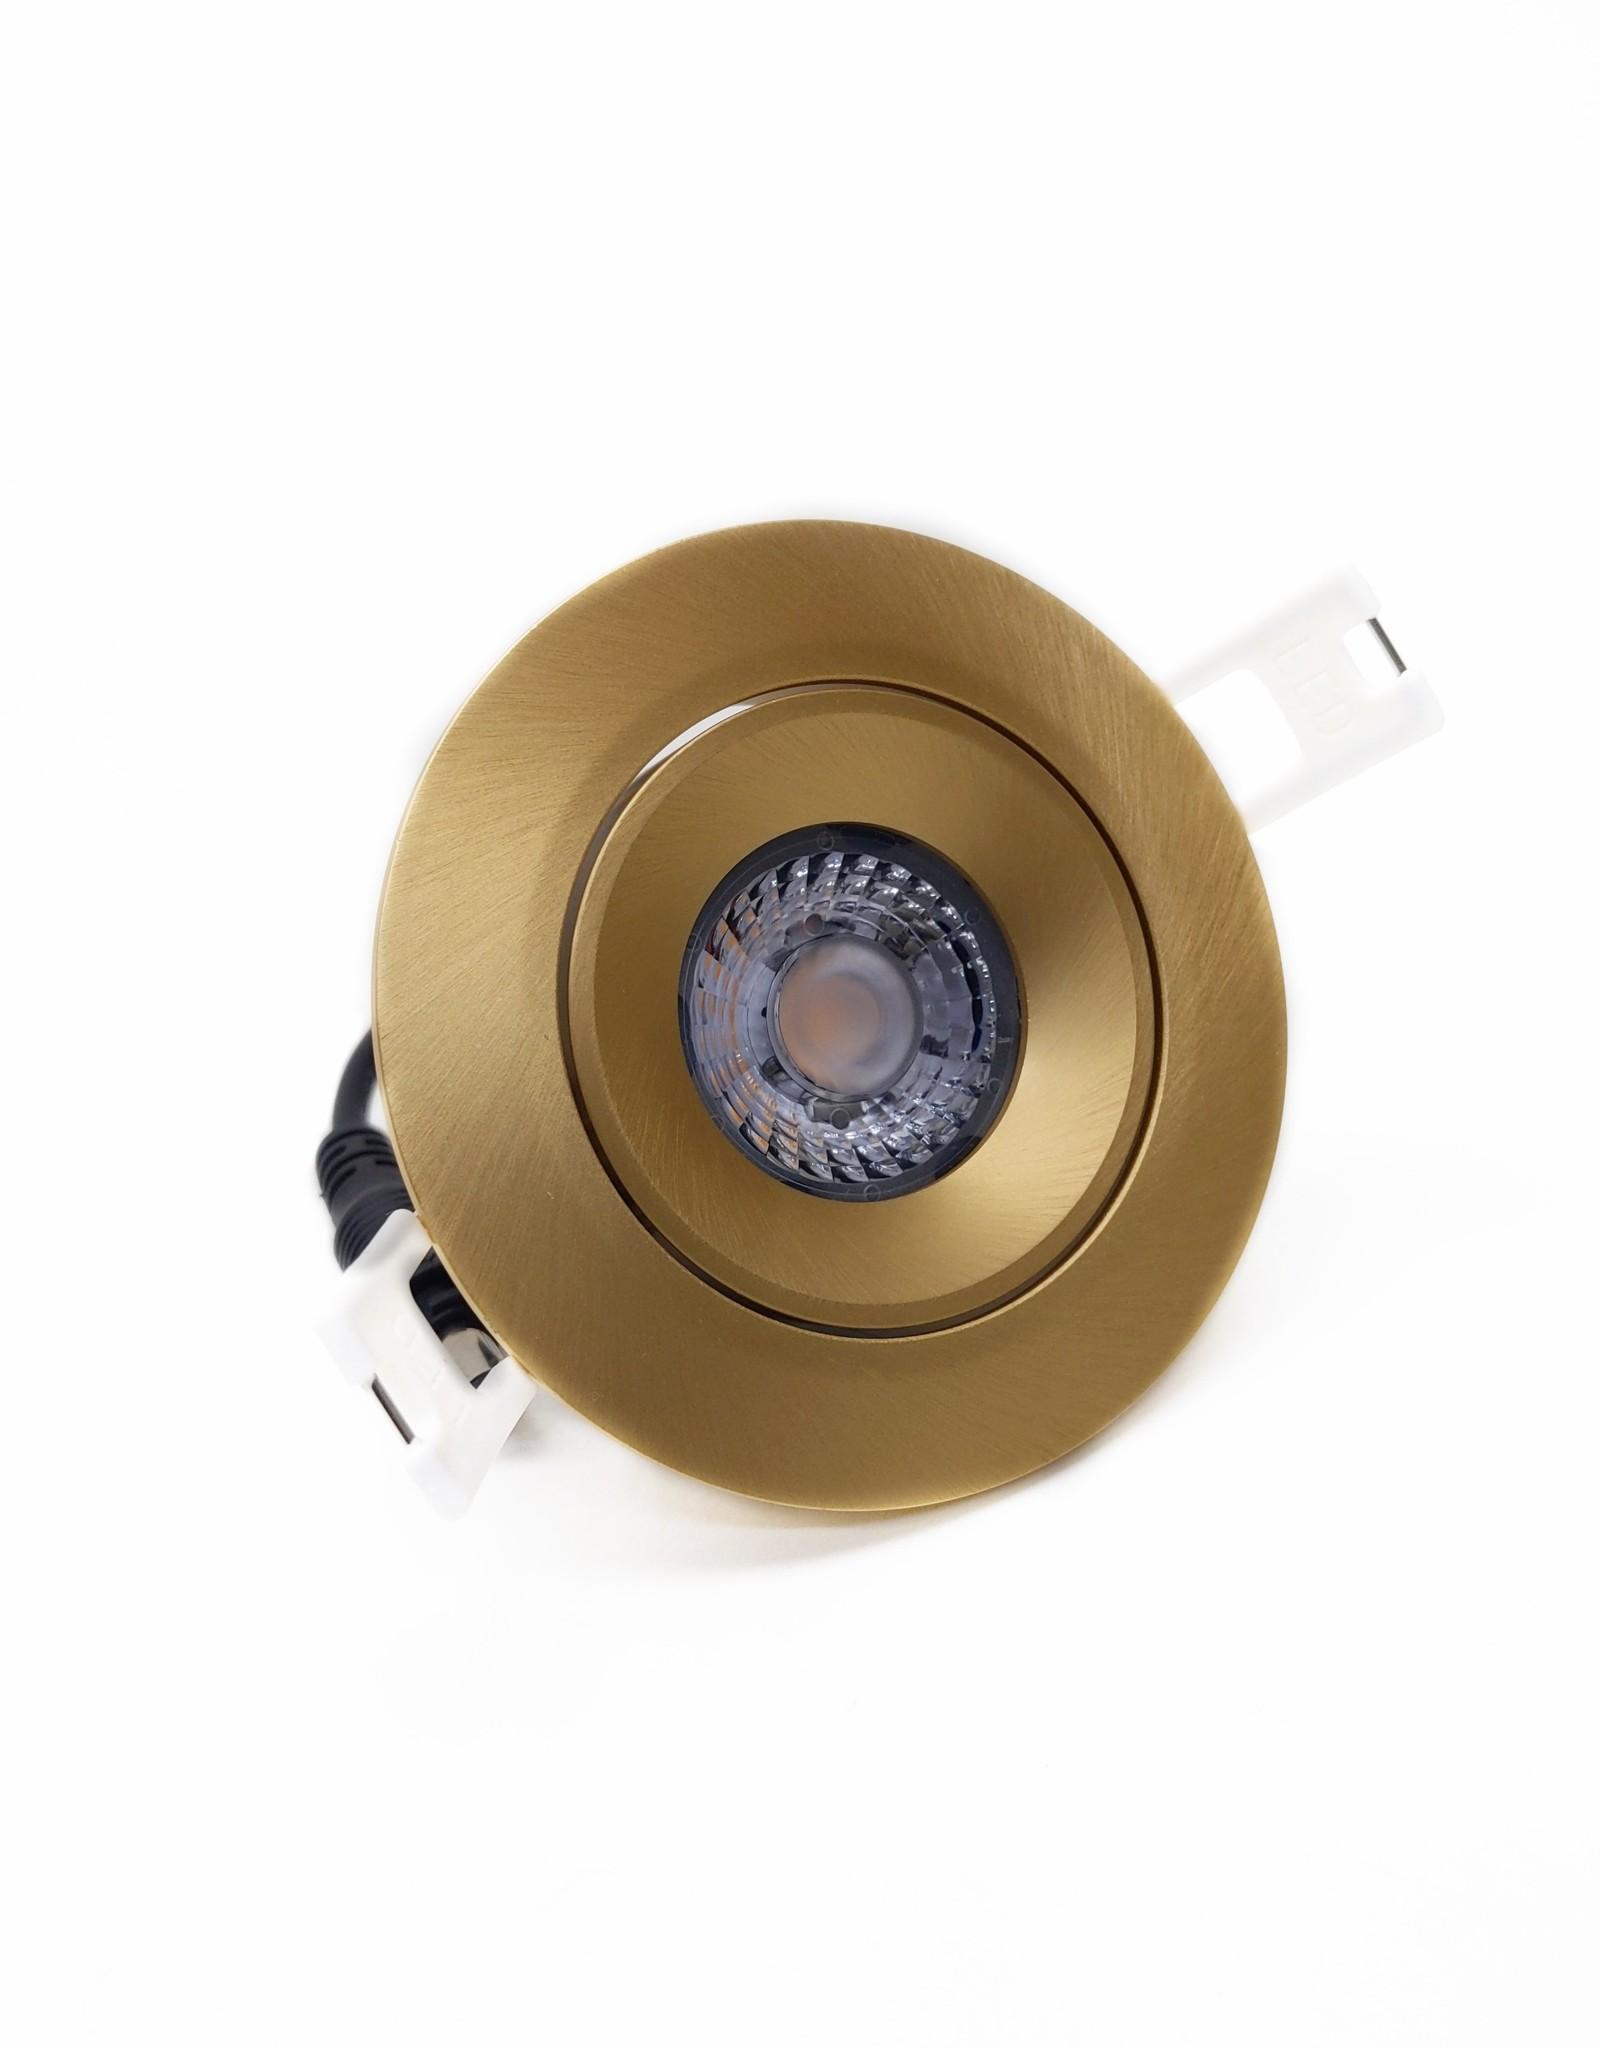 LedLed Addy led kantelspot rond goud dimbaar - Interieur lens